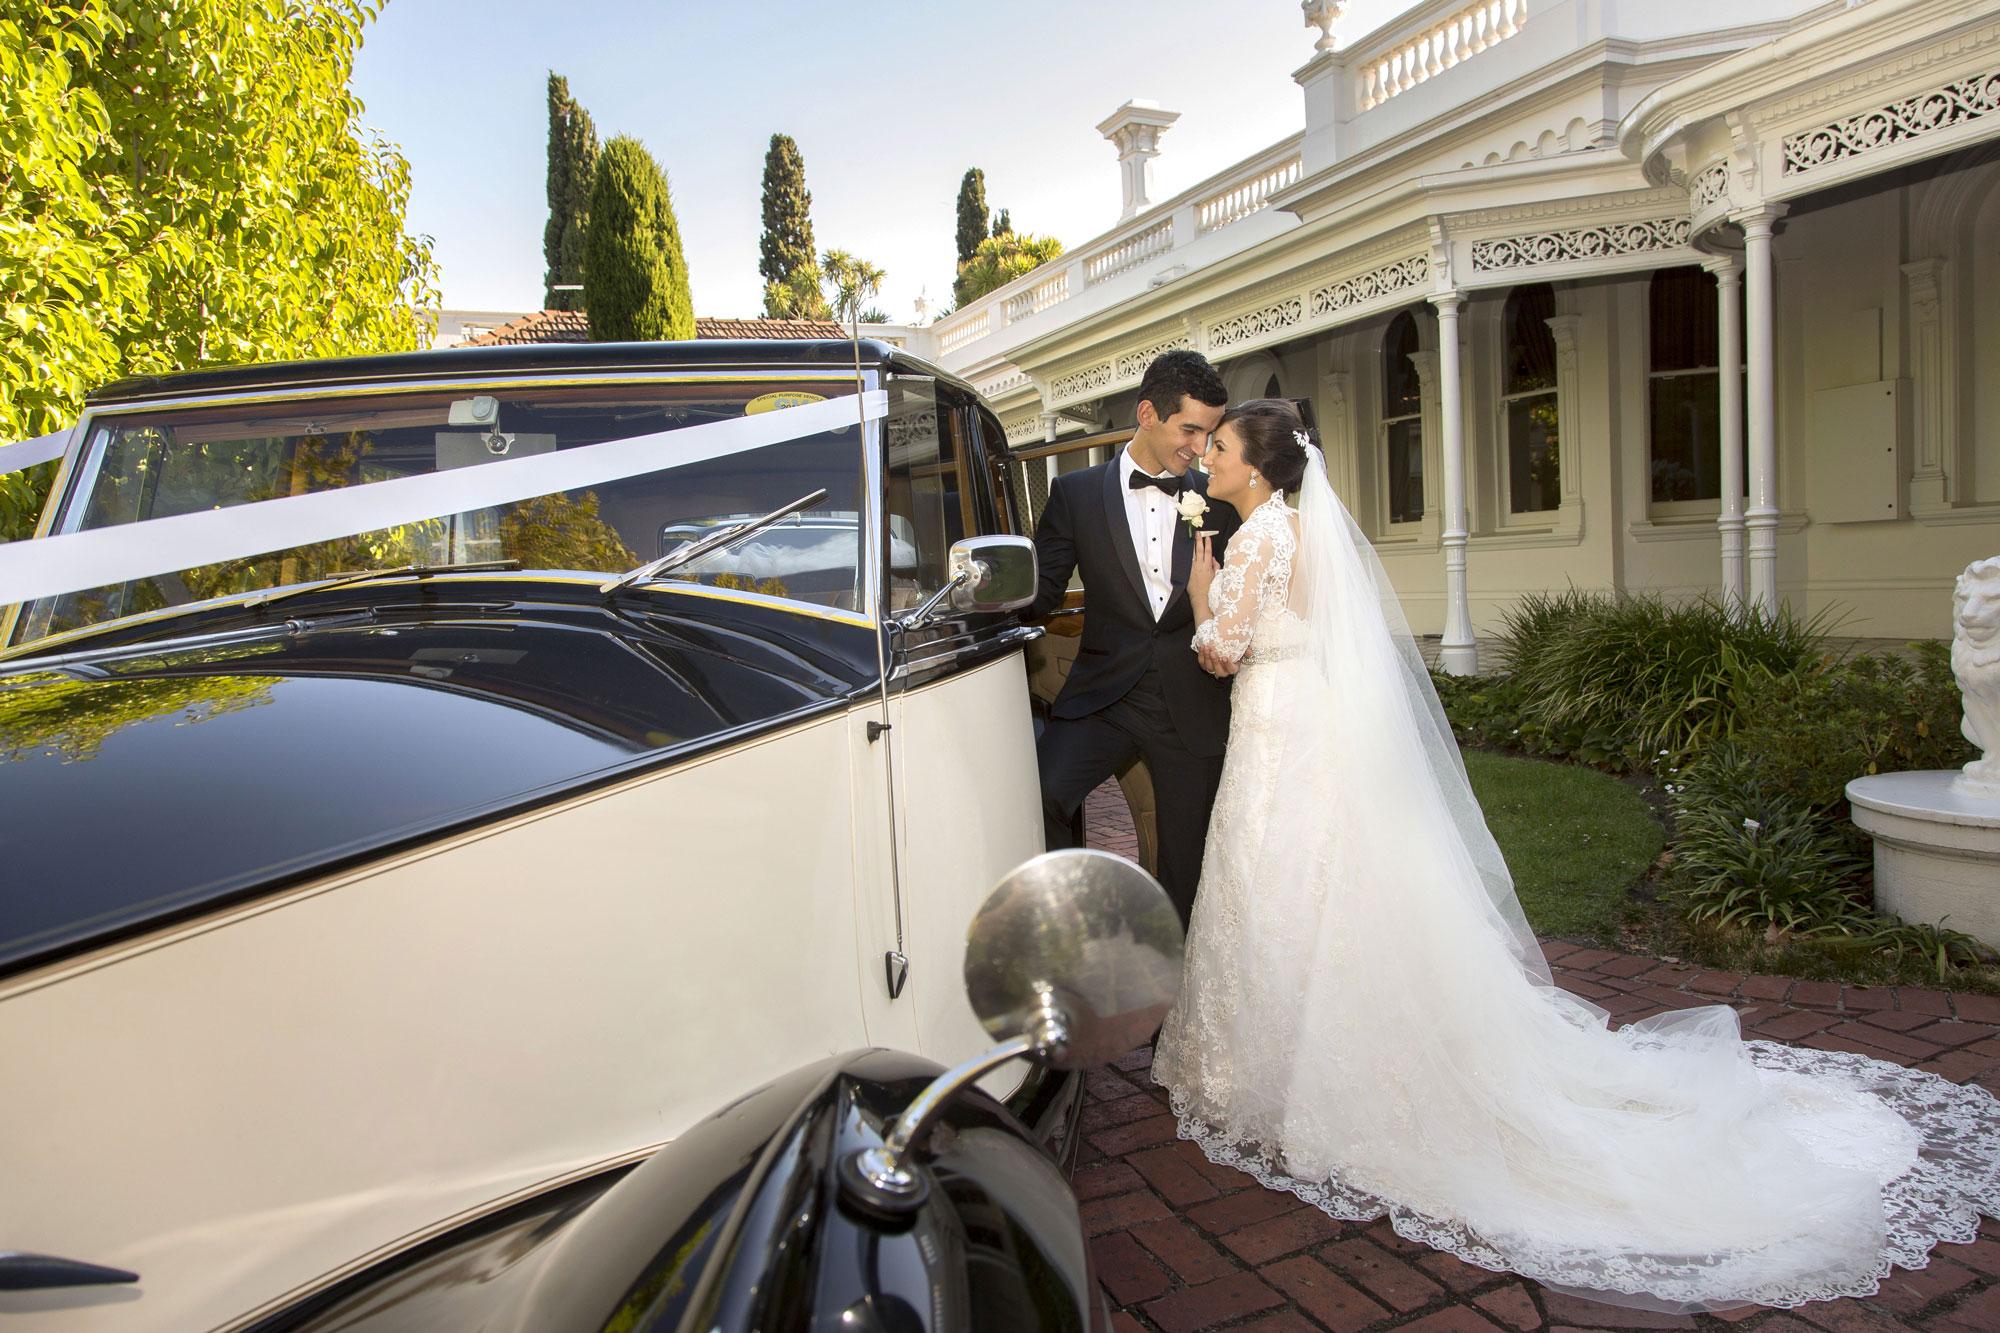 wedding photography at quat quatta